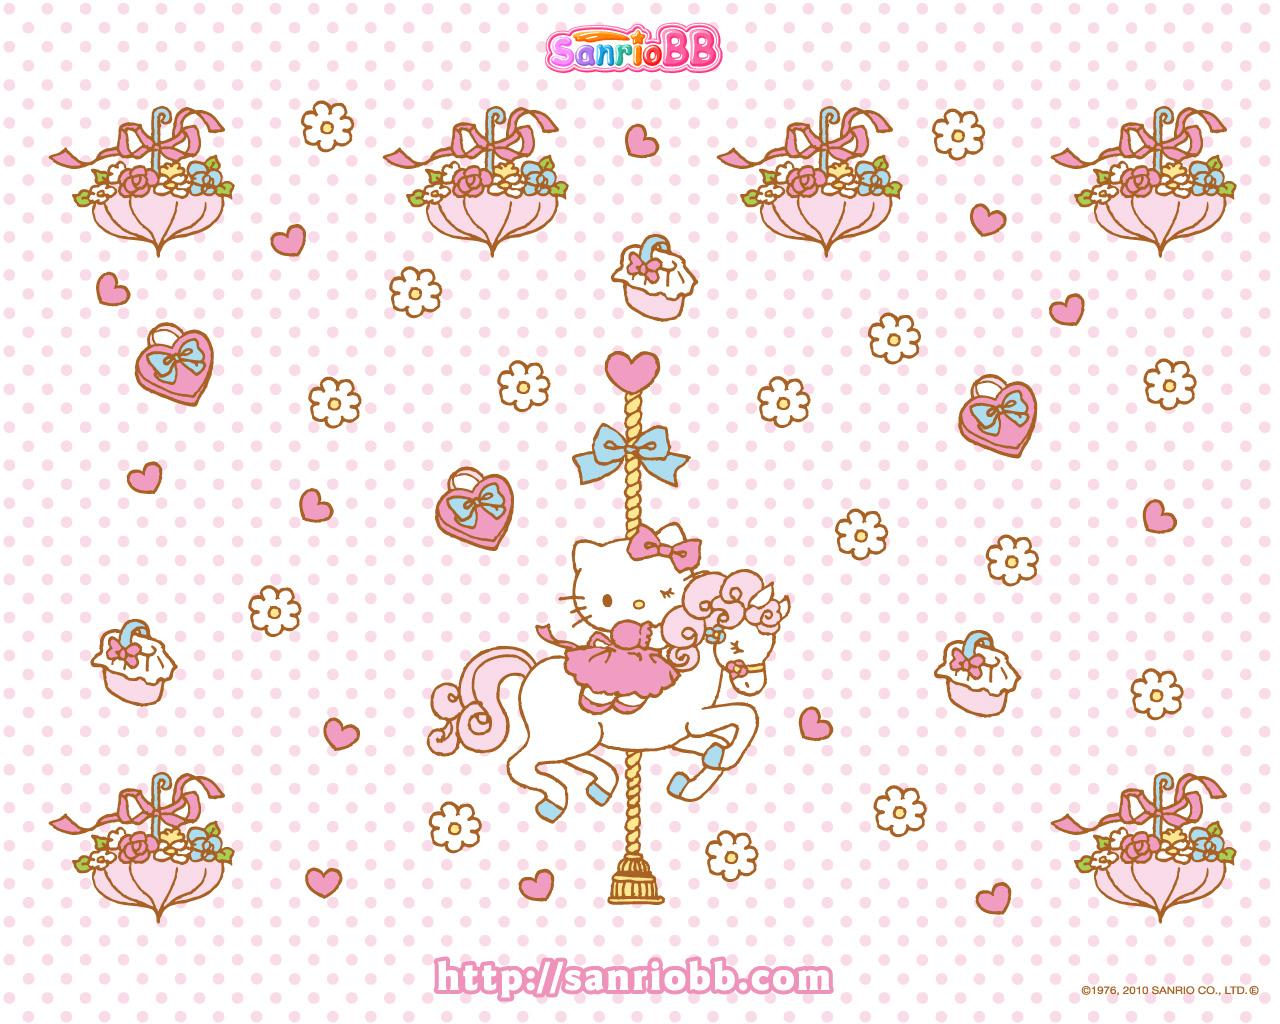 Sugar Bunnies Wallpaper Sanrio Wallpapers Kawaii Images   Frompo 1280x1024